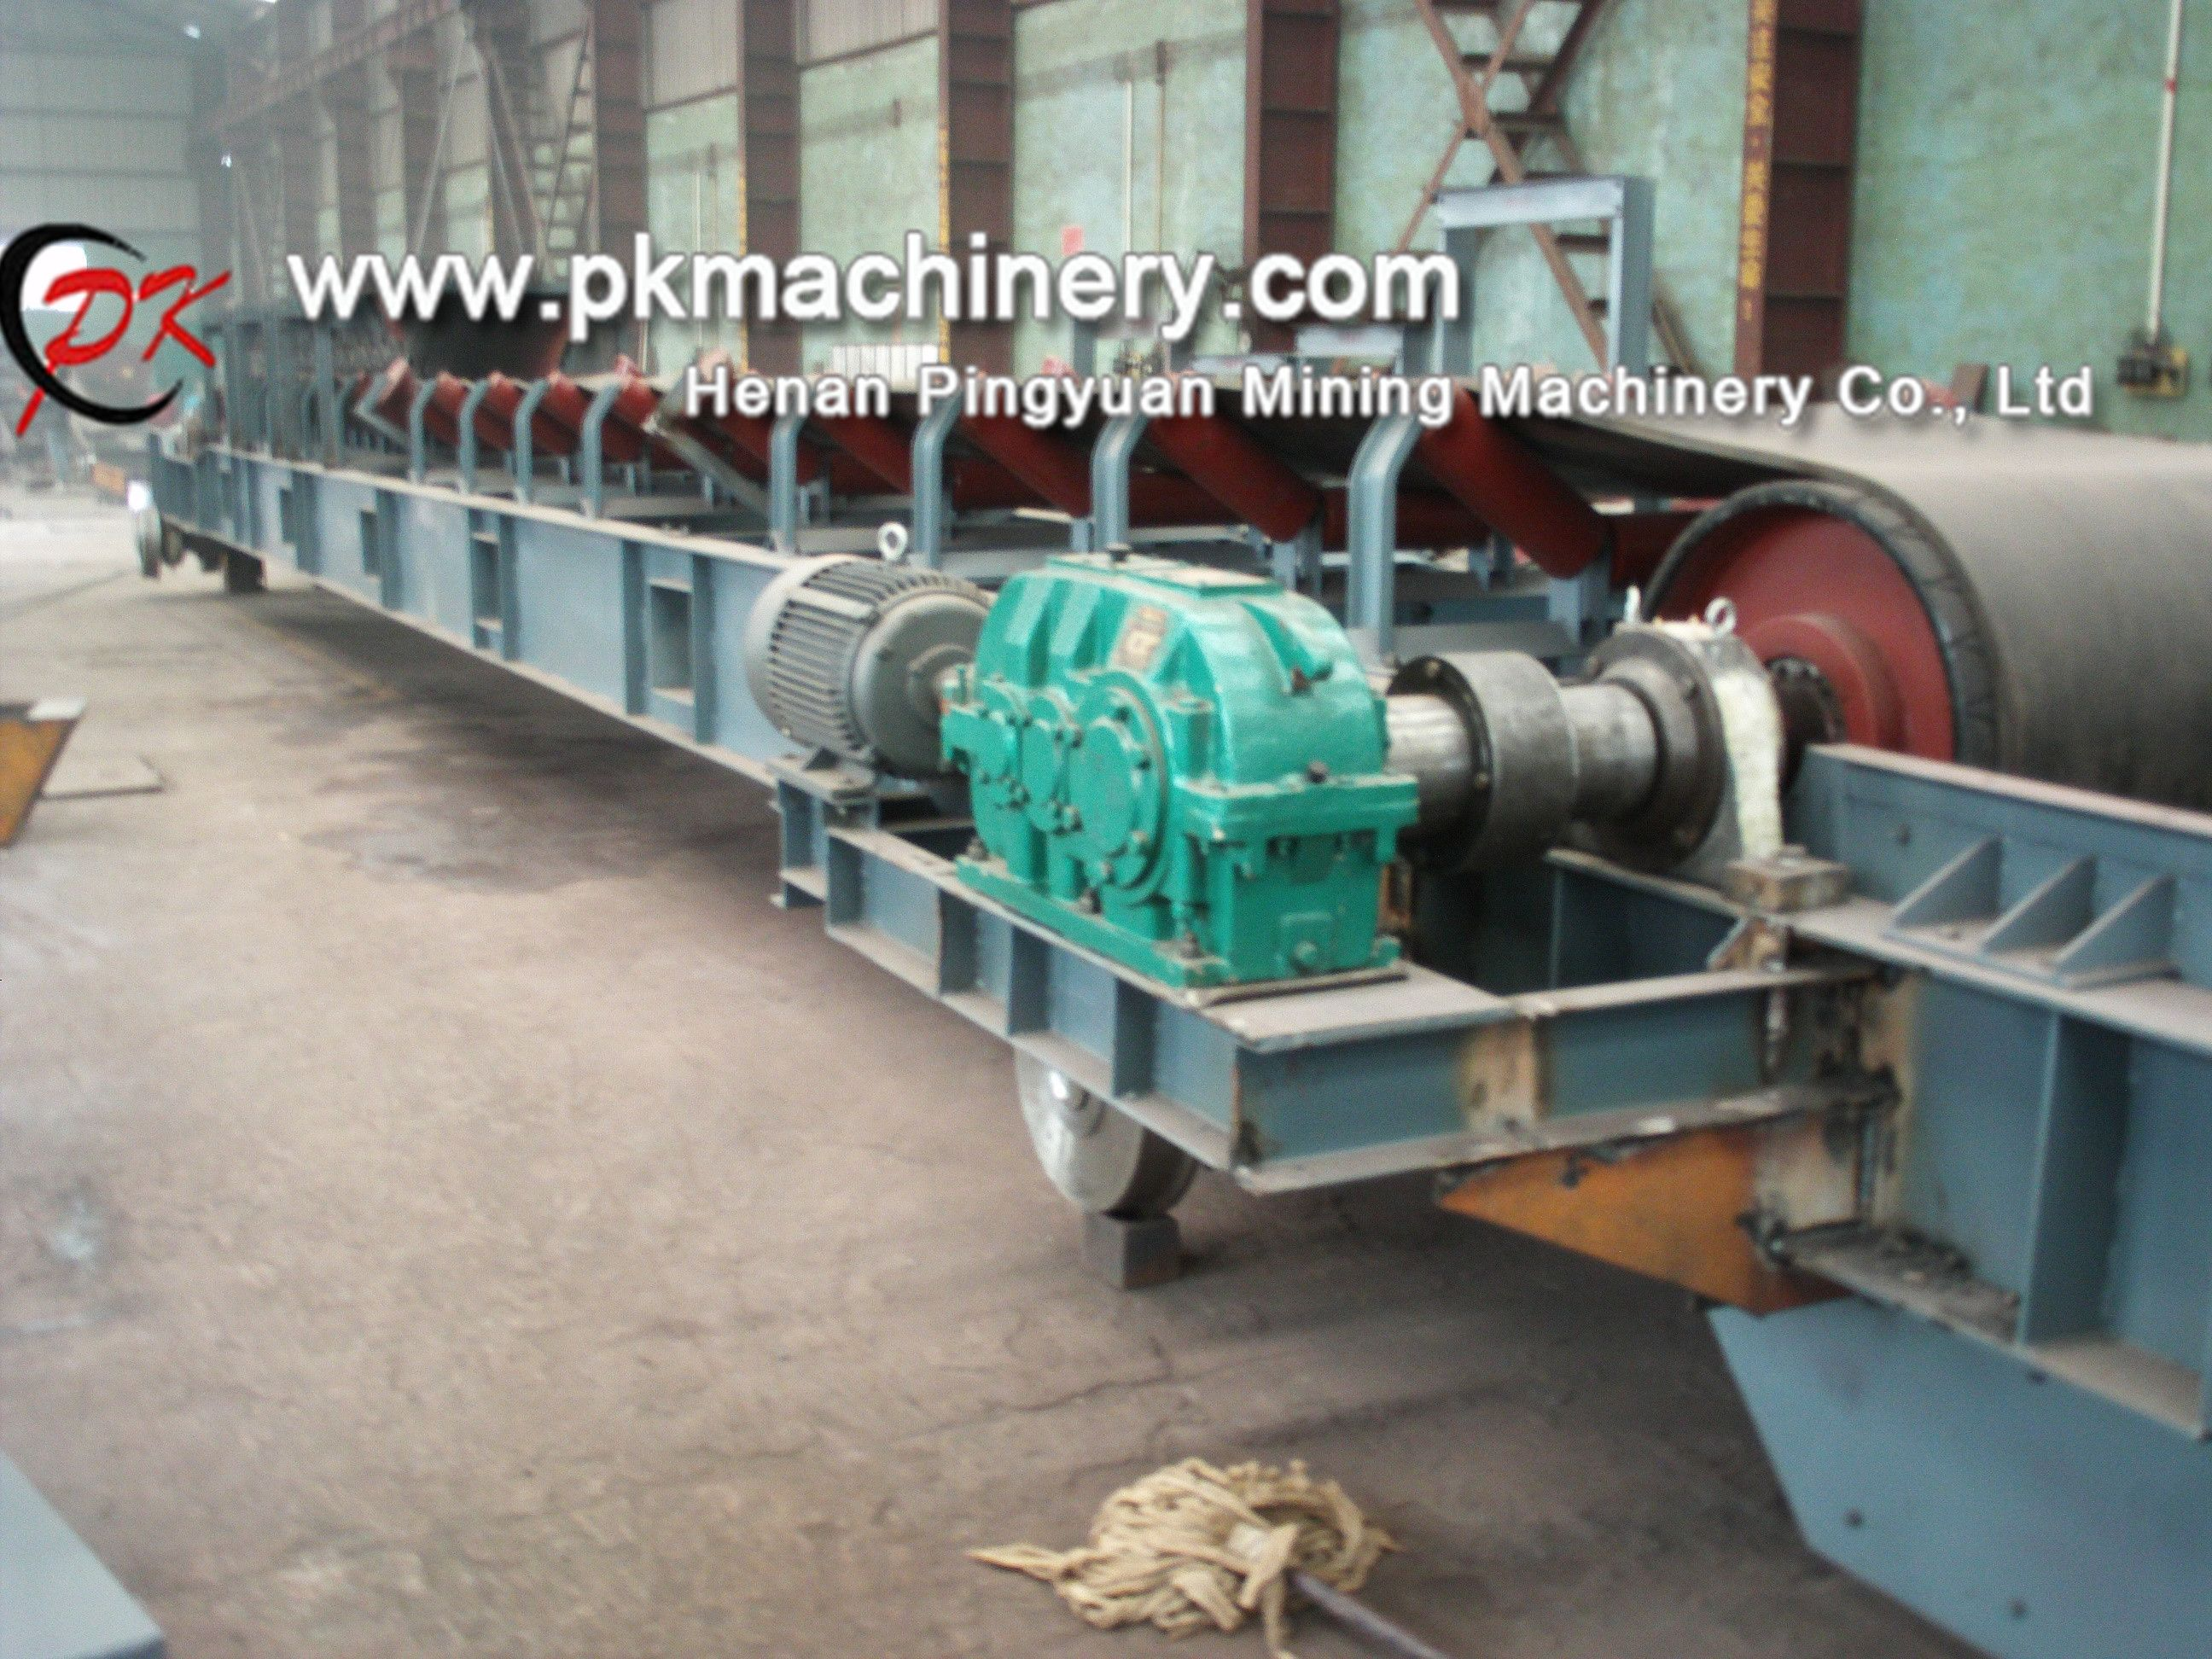 shuttle belt conveyor (With images) Conveyor, Henan